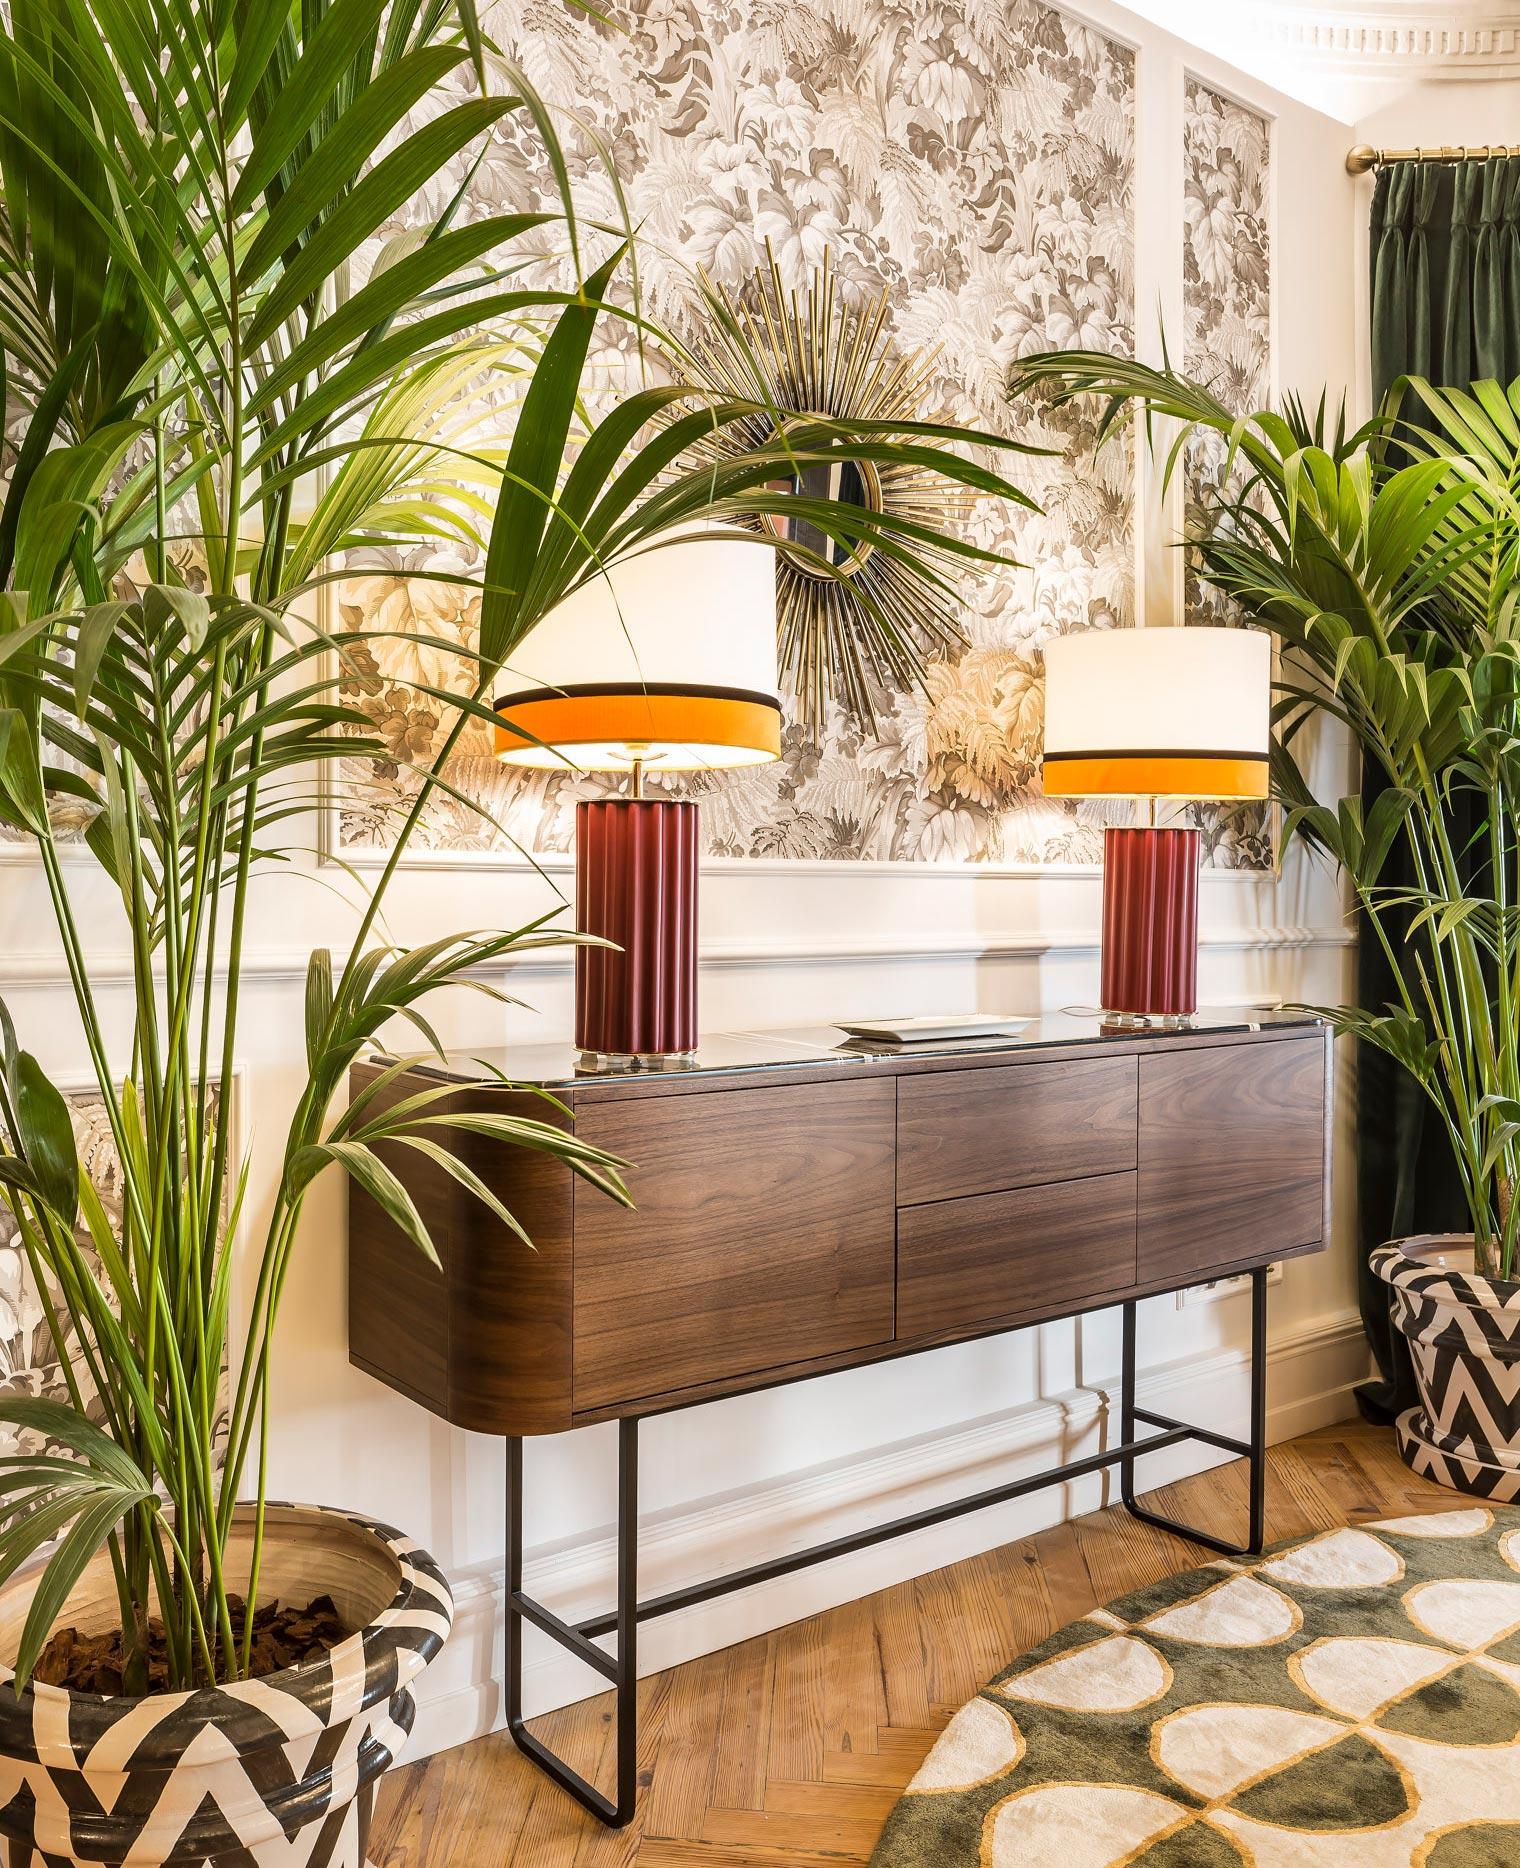 Colección Adara Momocca Casa Decor 2021 espacio Singular Living